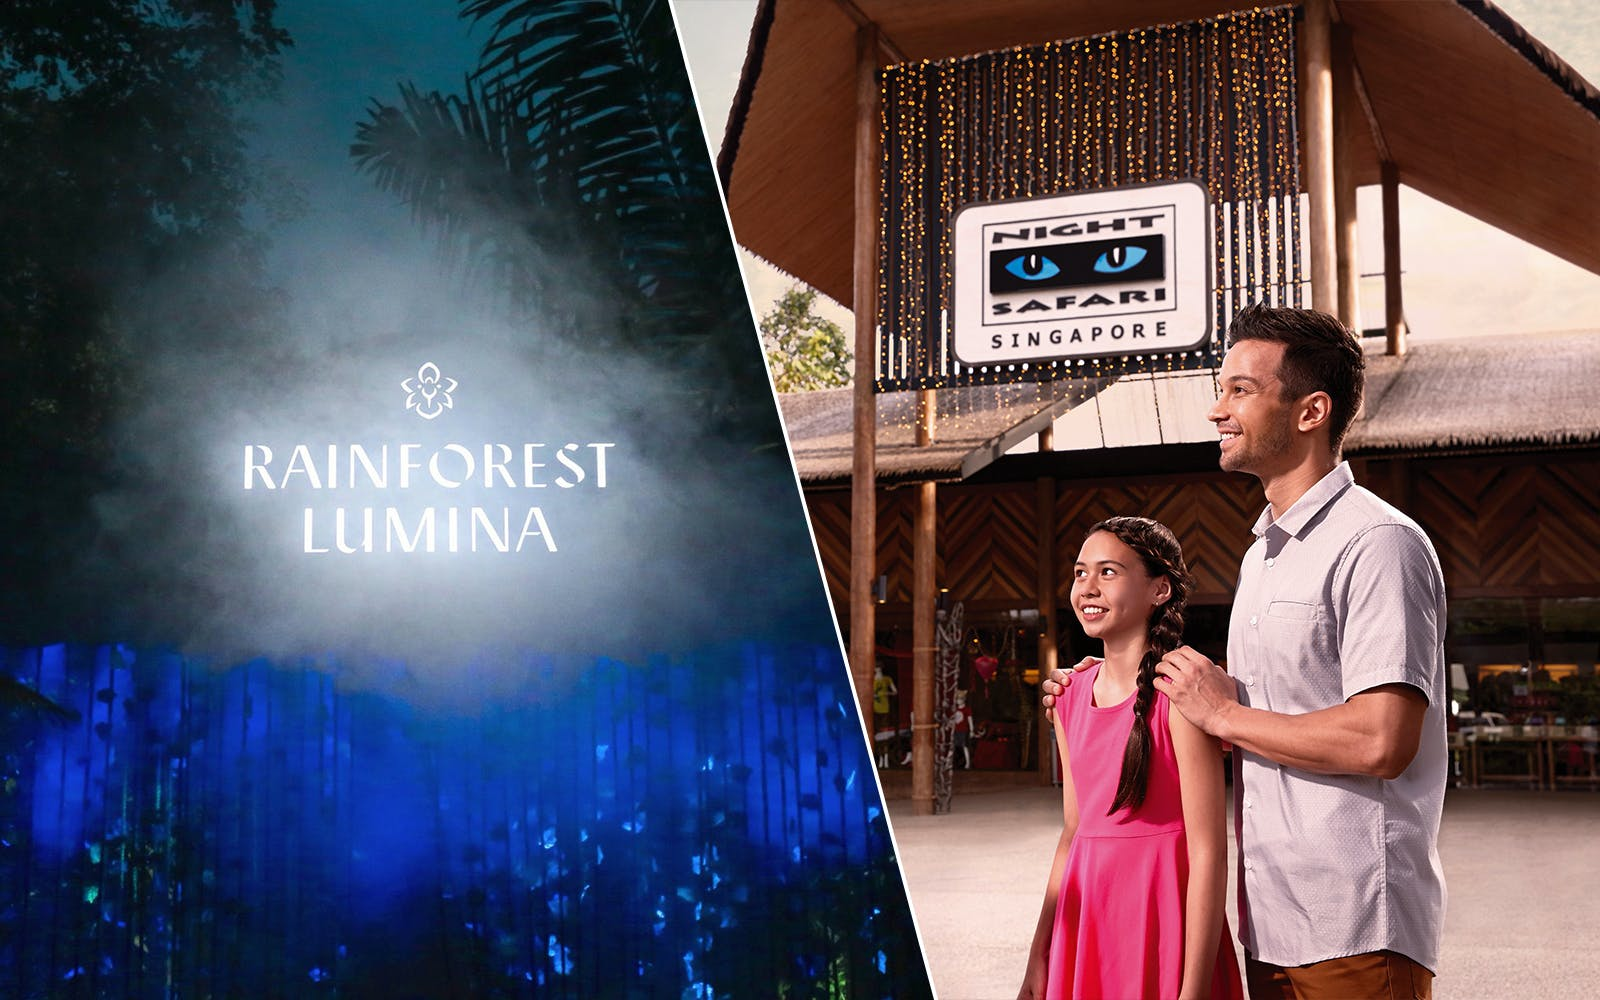 rainforest lumina and night safari tickets